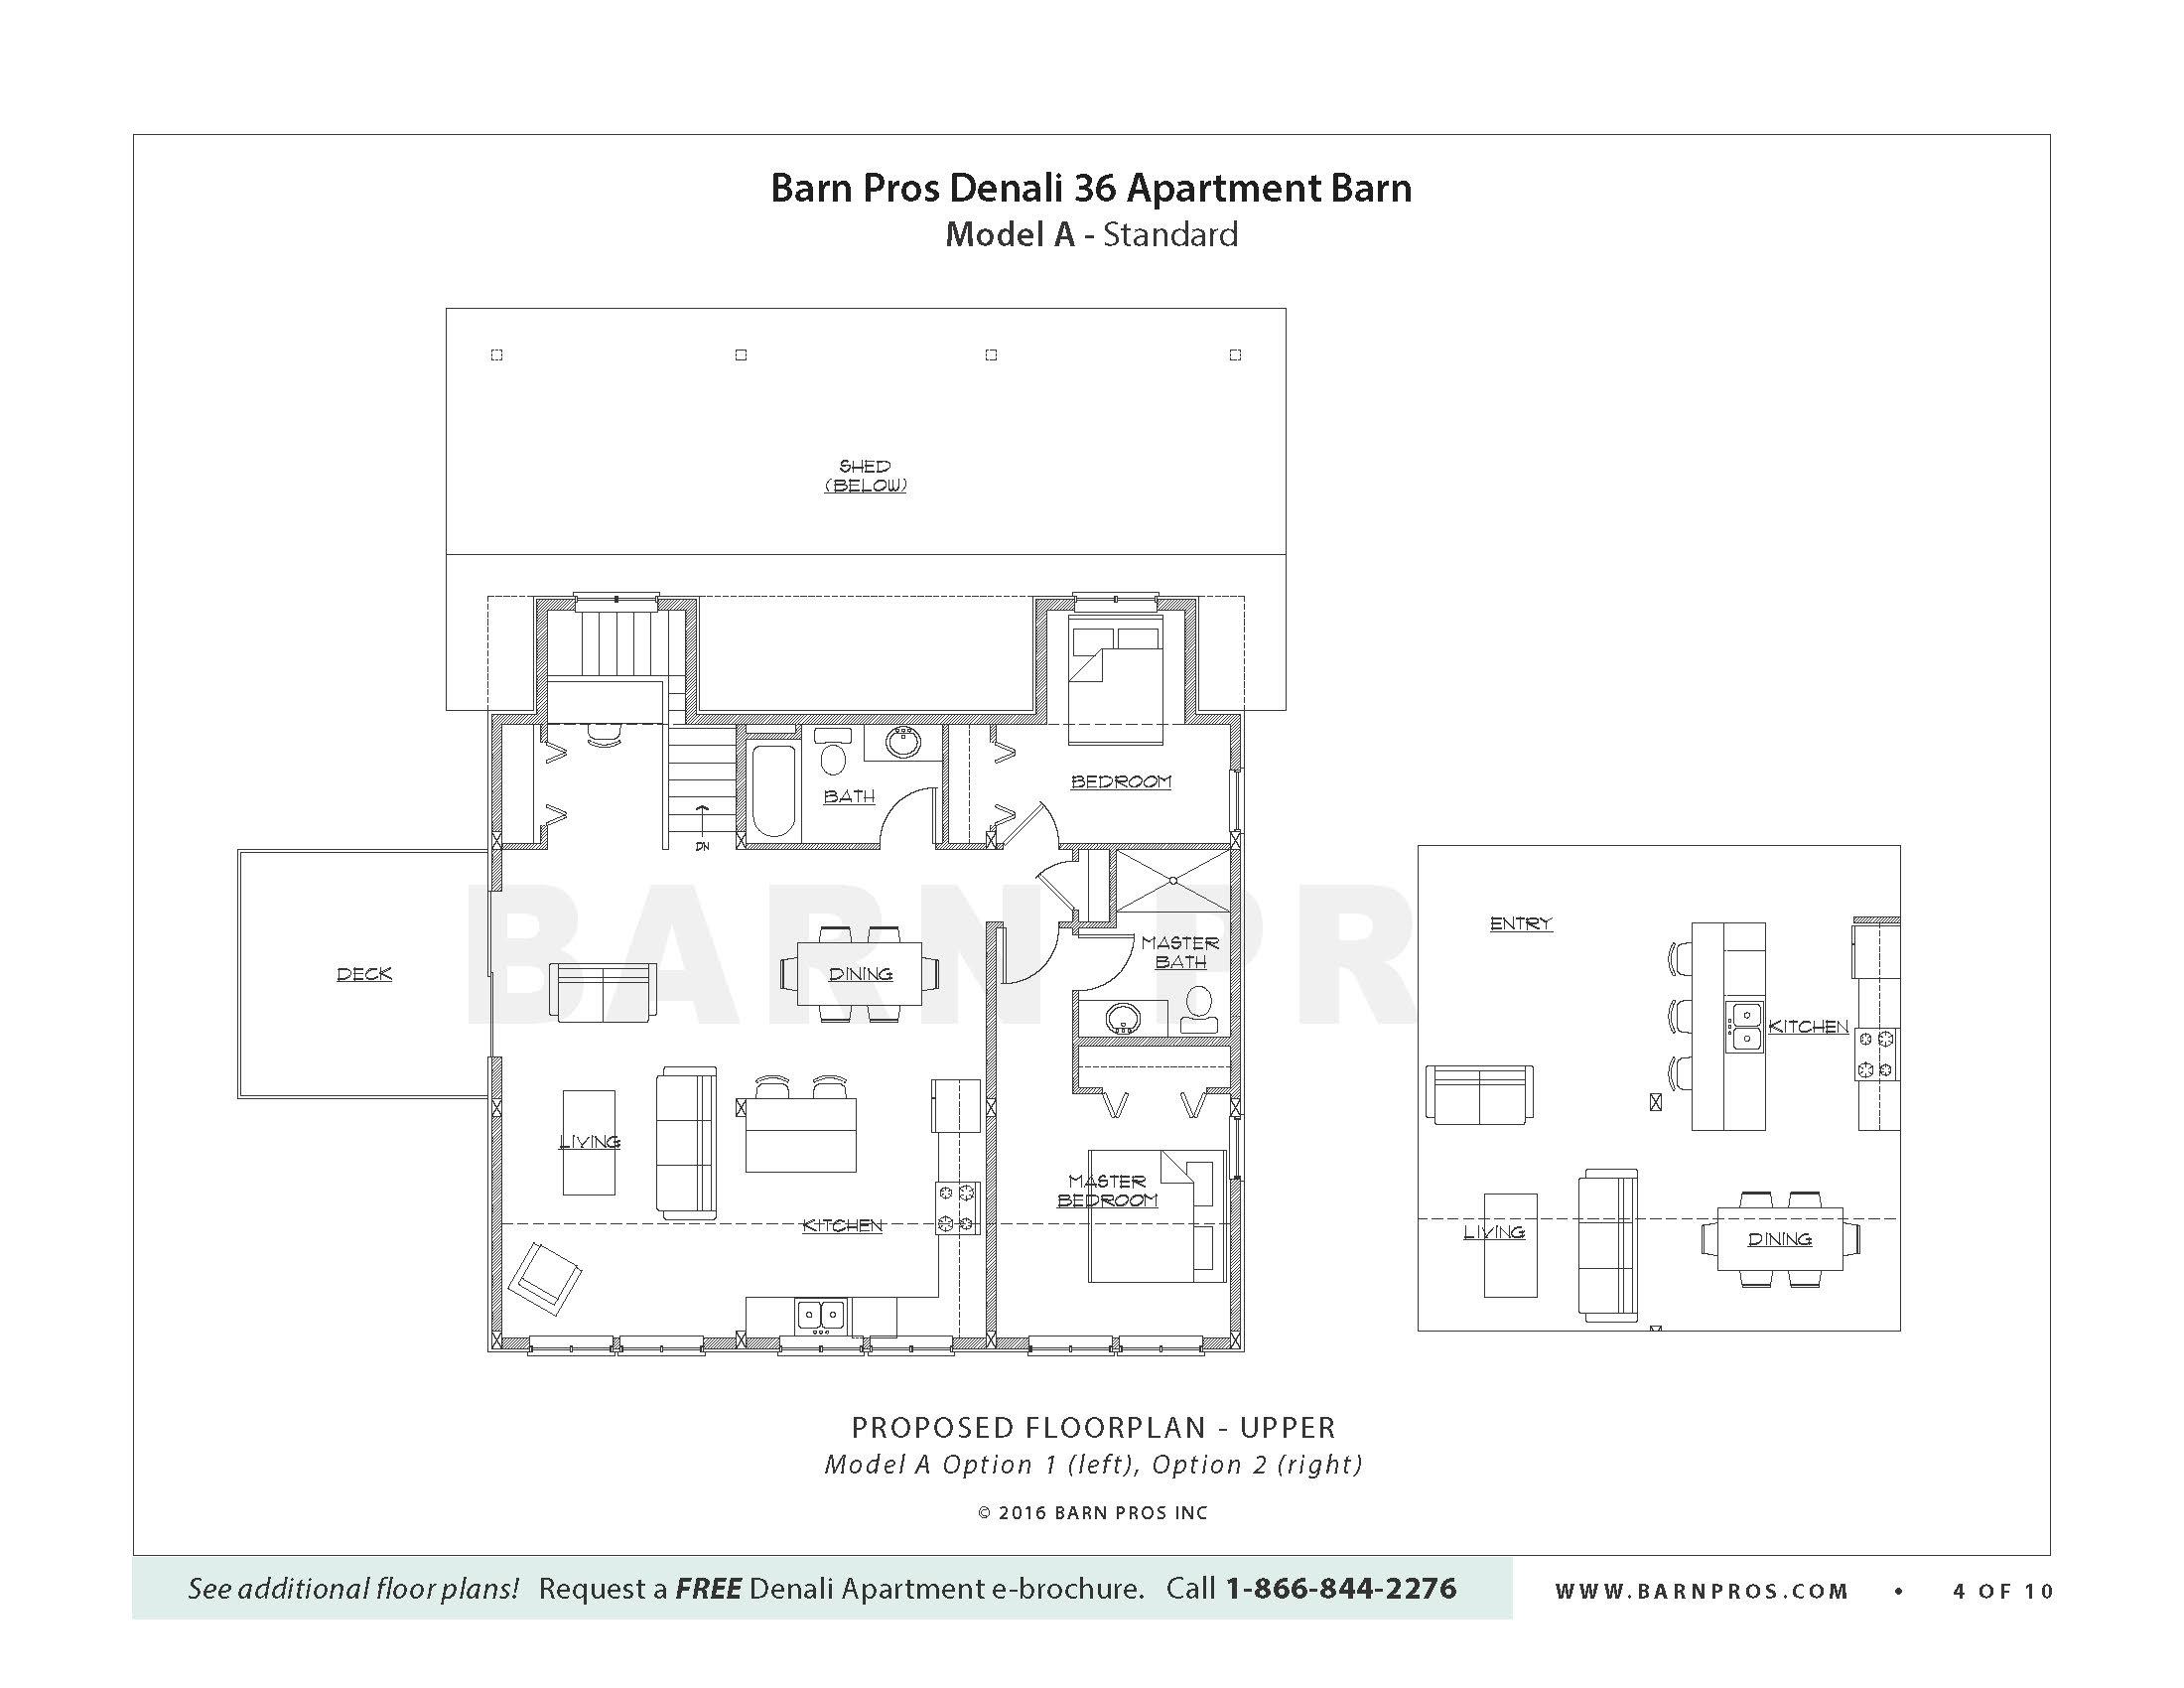 Denali Barn Apartment Barn Pros